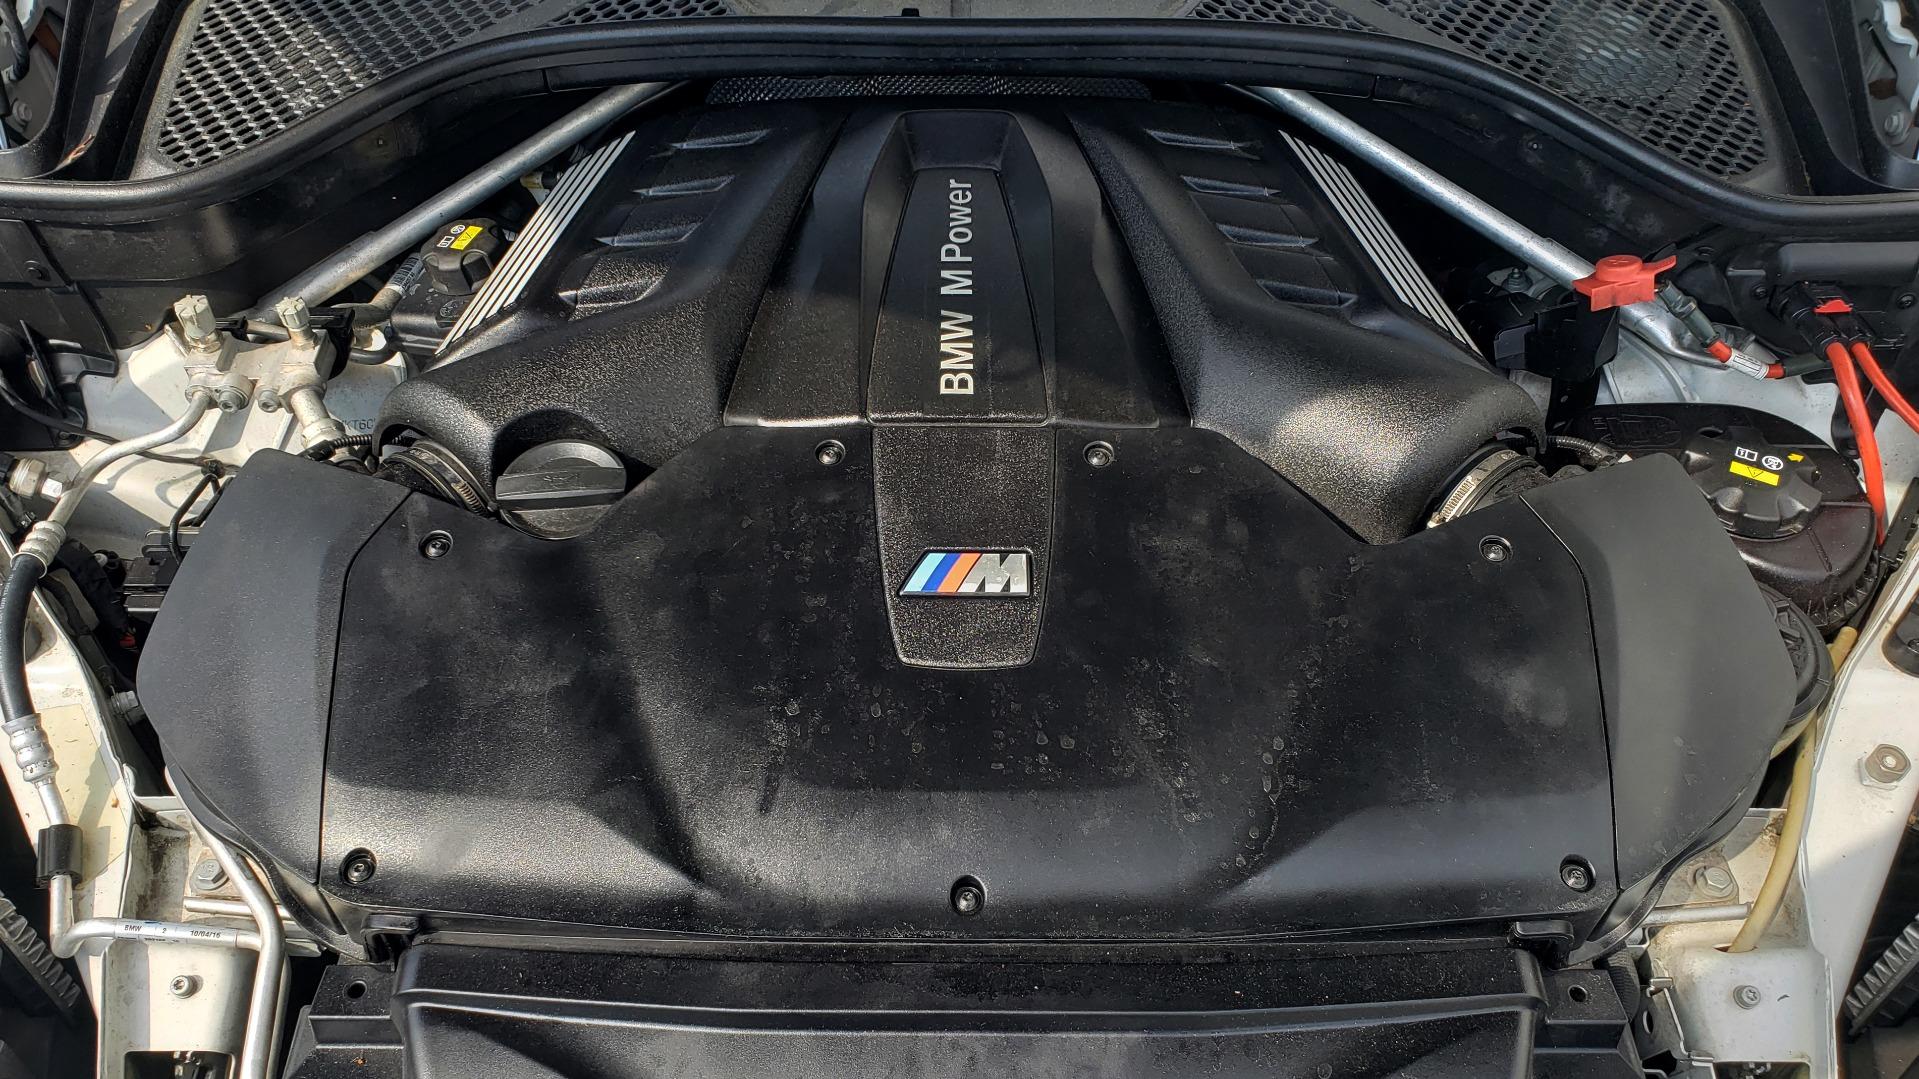 Used 2017 BMW X5 M EXECUTIVE PKG / NAV / DRVR ASST / BSM / HUD / HTD STS / WIFI for sale Sold at Formula Imports in Charlotte NC 28227 14